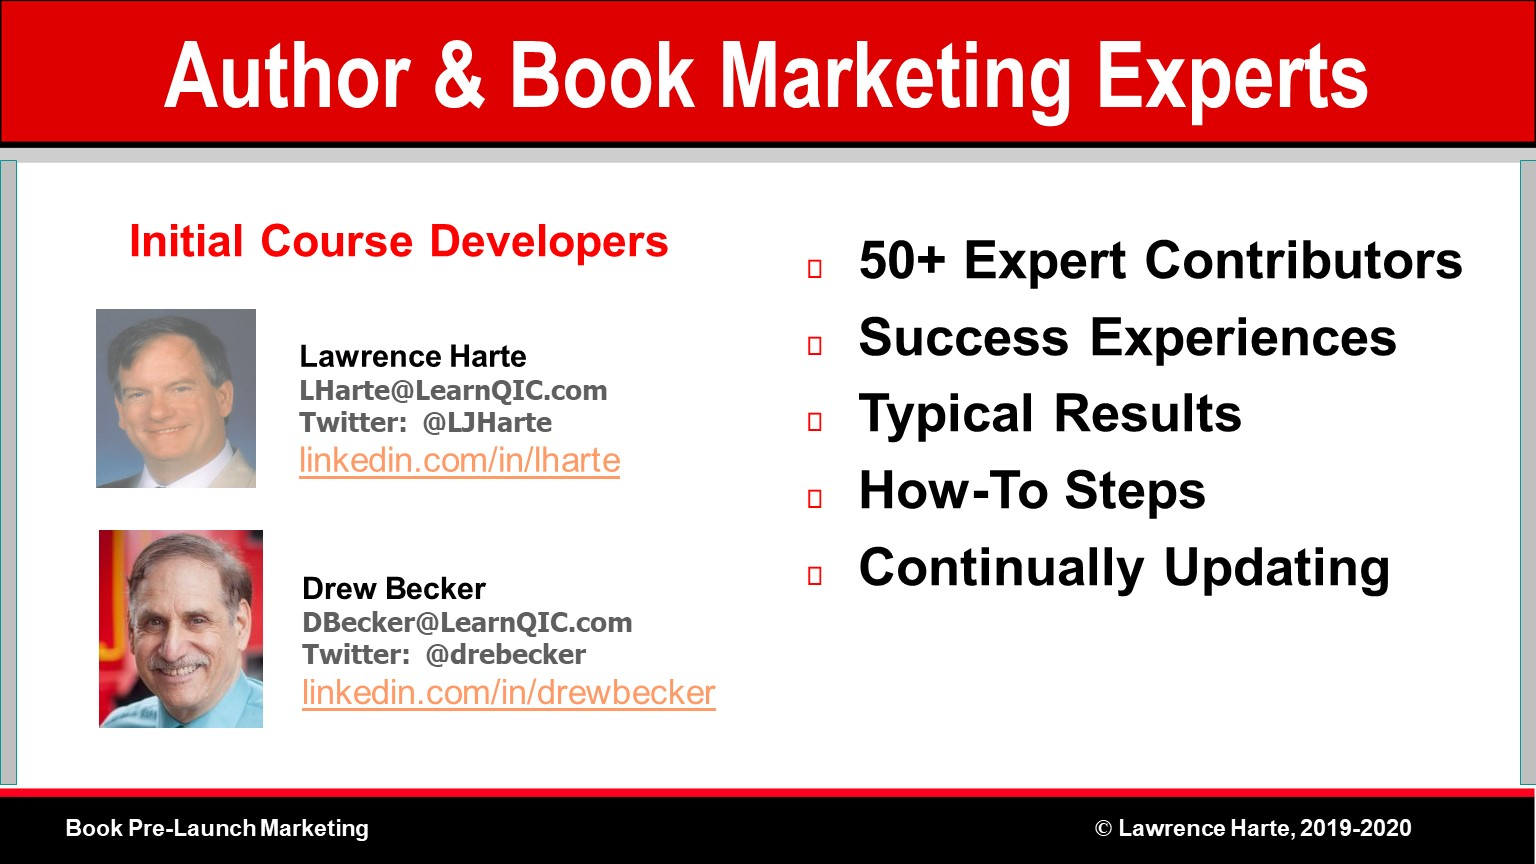 Book Pre-Launch Marketing Course Developers